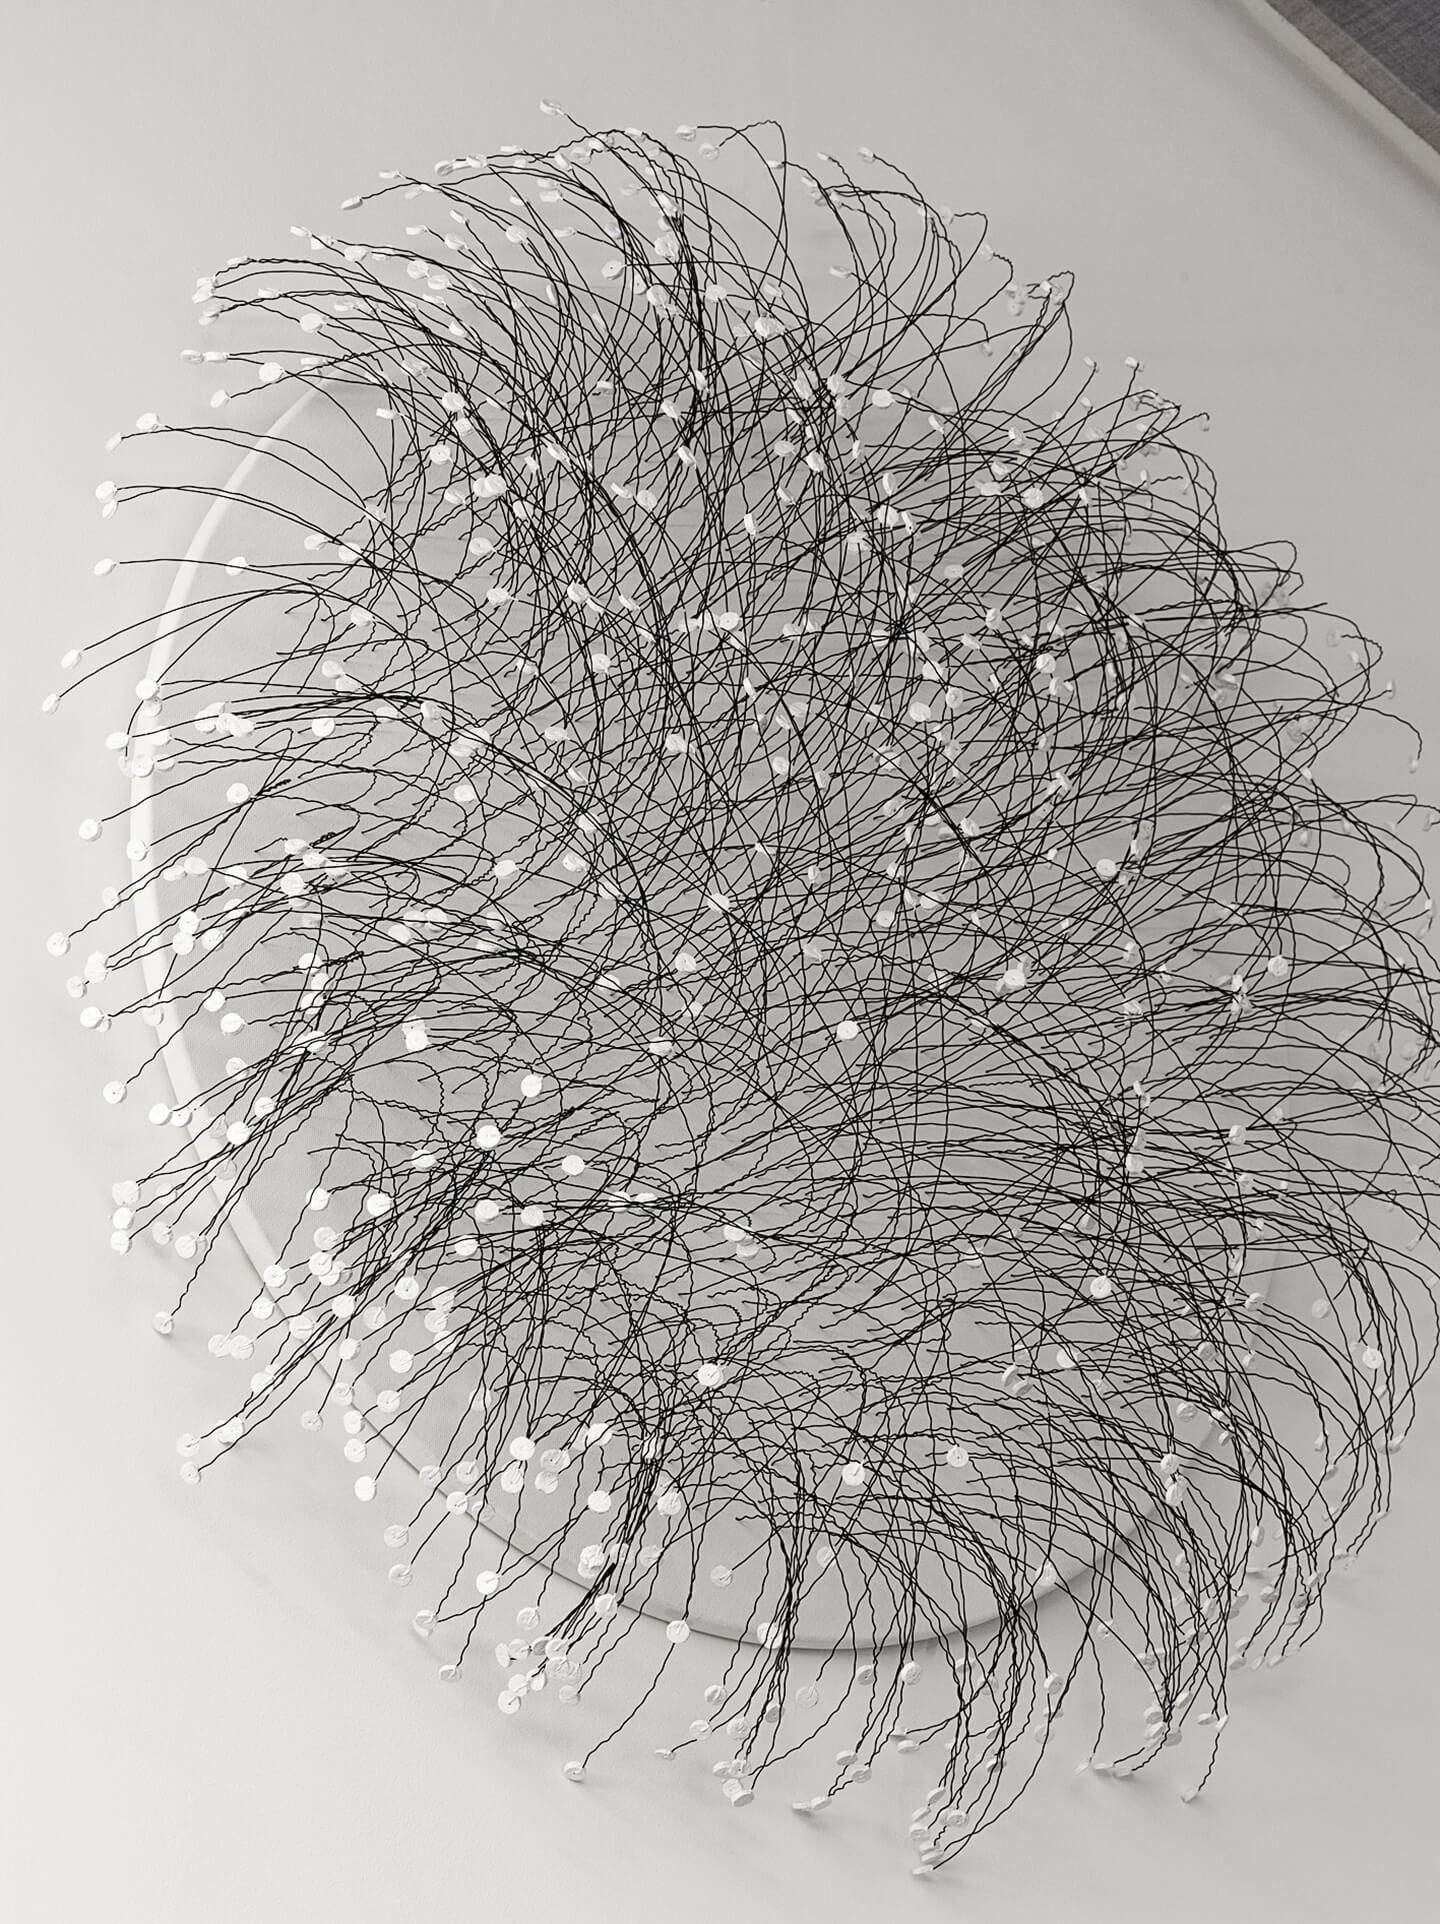 Renate Fabricius, Life, 2016, bottle corks, wire, acrylic paint on canvas, Diameter 70cm